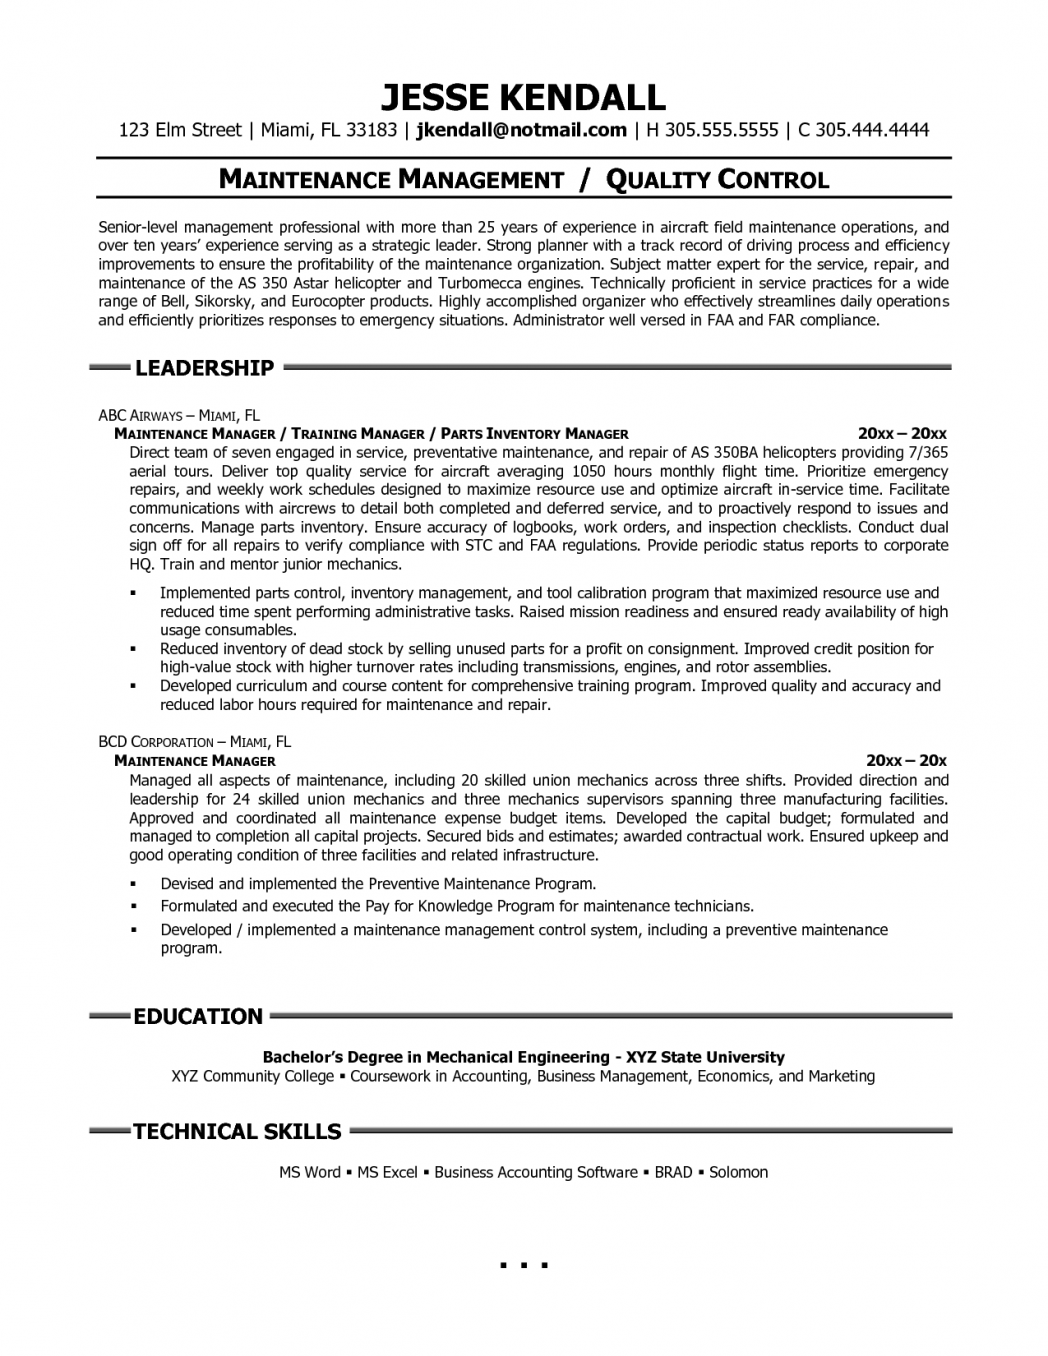 Maintenance Man Resume Sample 2019 Maintenance Man Resume Objective 2020 Maintenance Man Resume Objective Manager Resume Engineering Resume Job Resume Samples